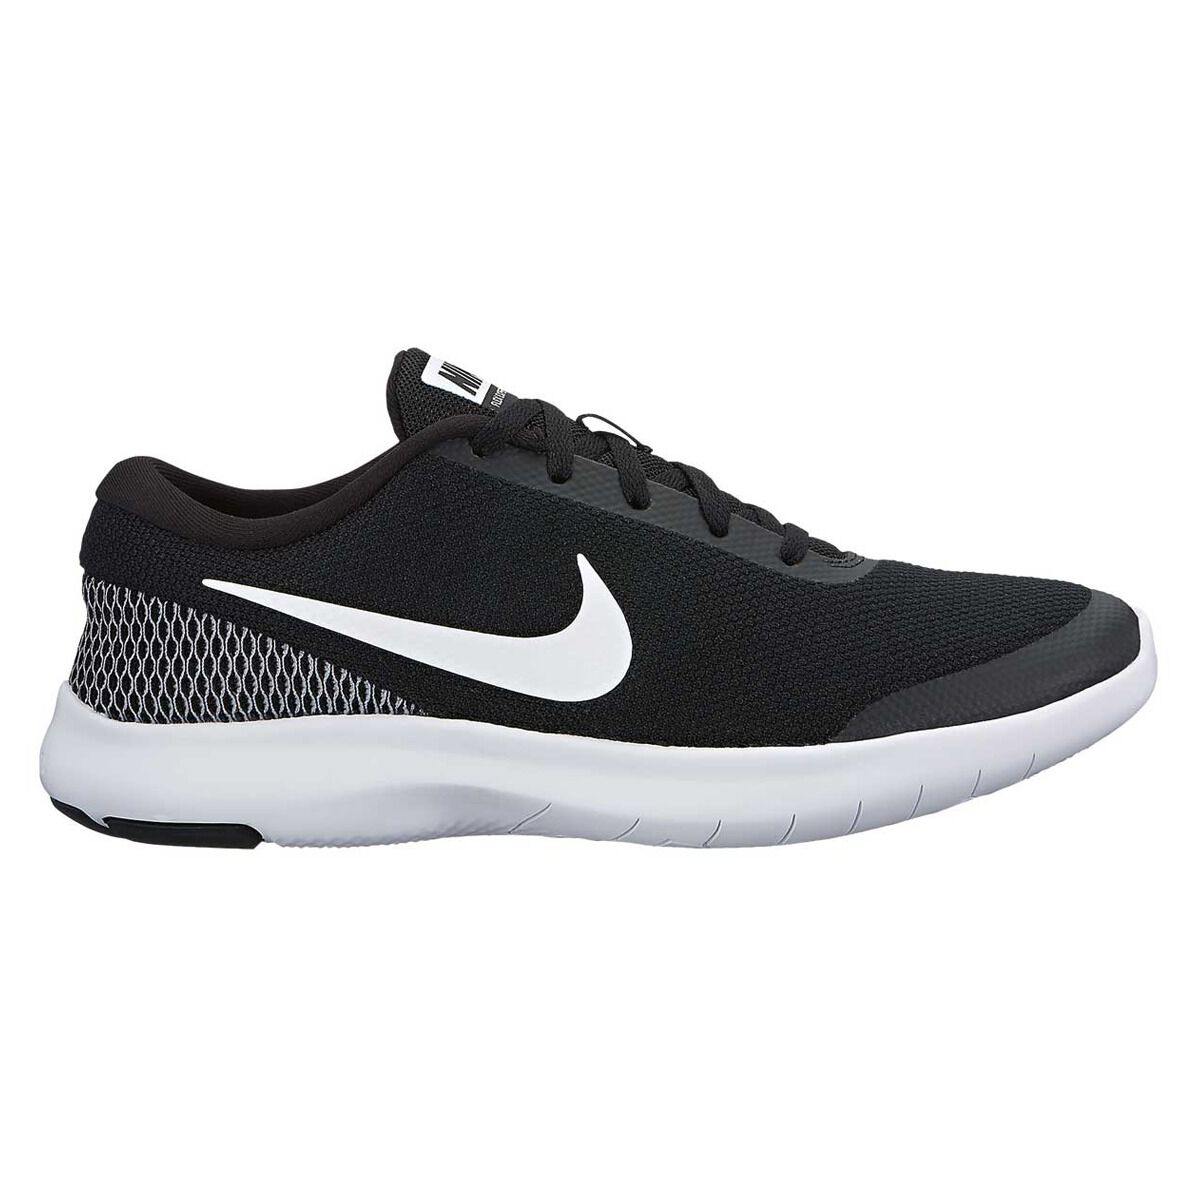 Nike Flex Experience Run 7 Mujeres Running Zapatos 6 Negro  Blanco Us 6 Zapatos bc39a1